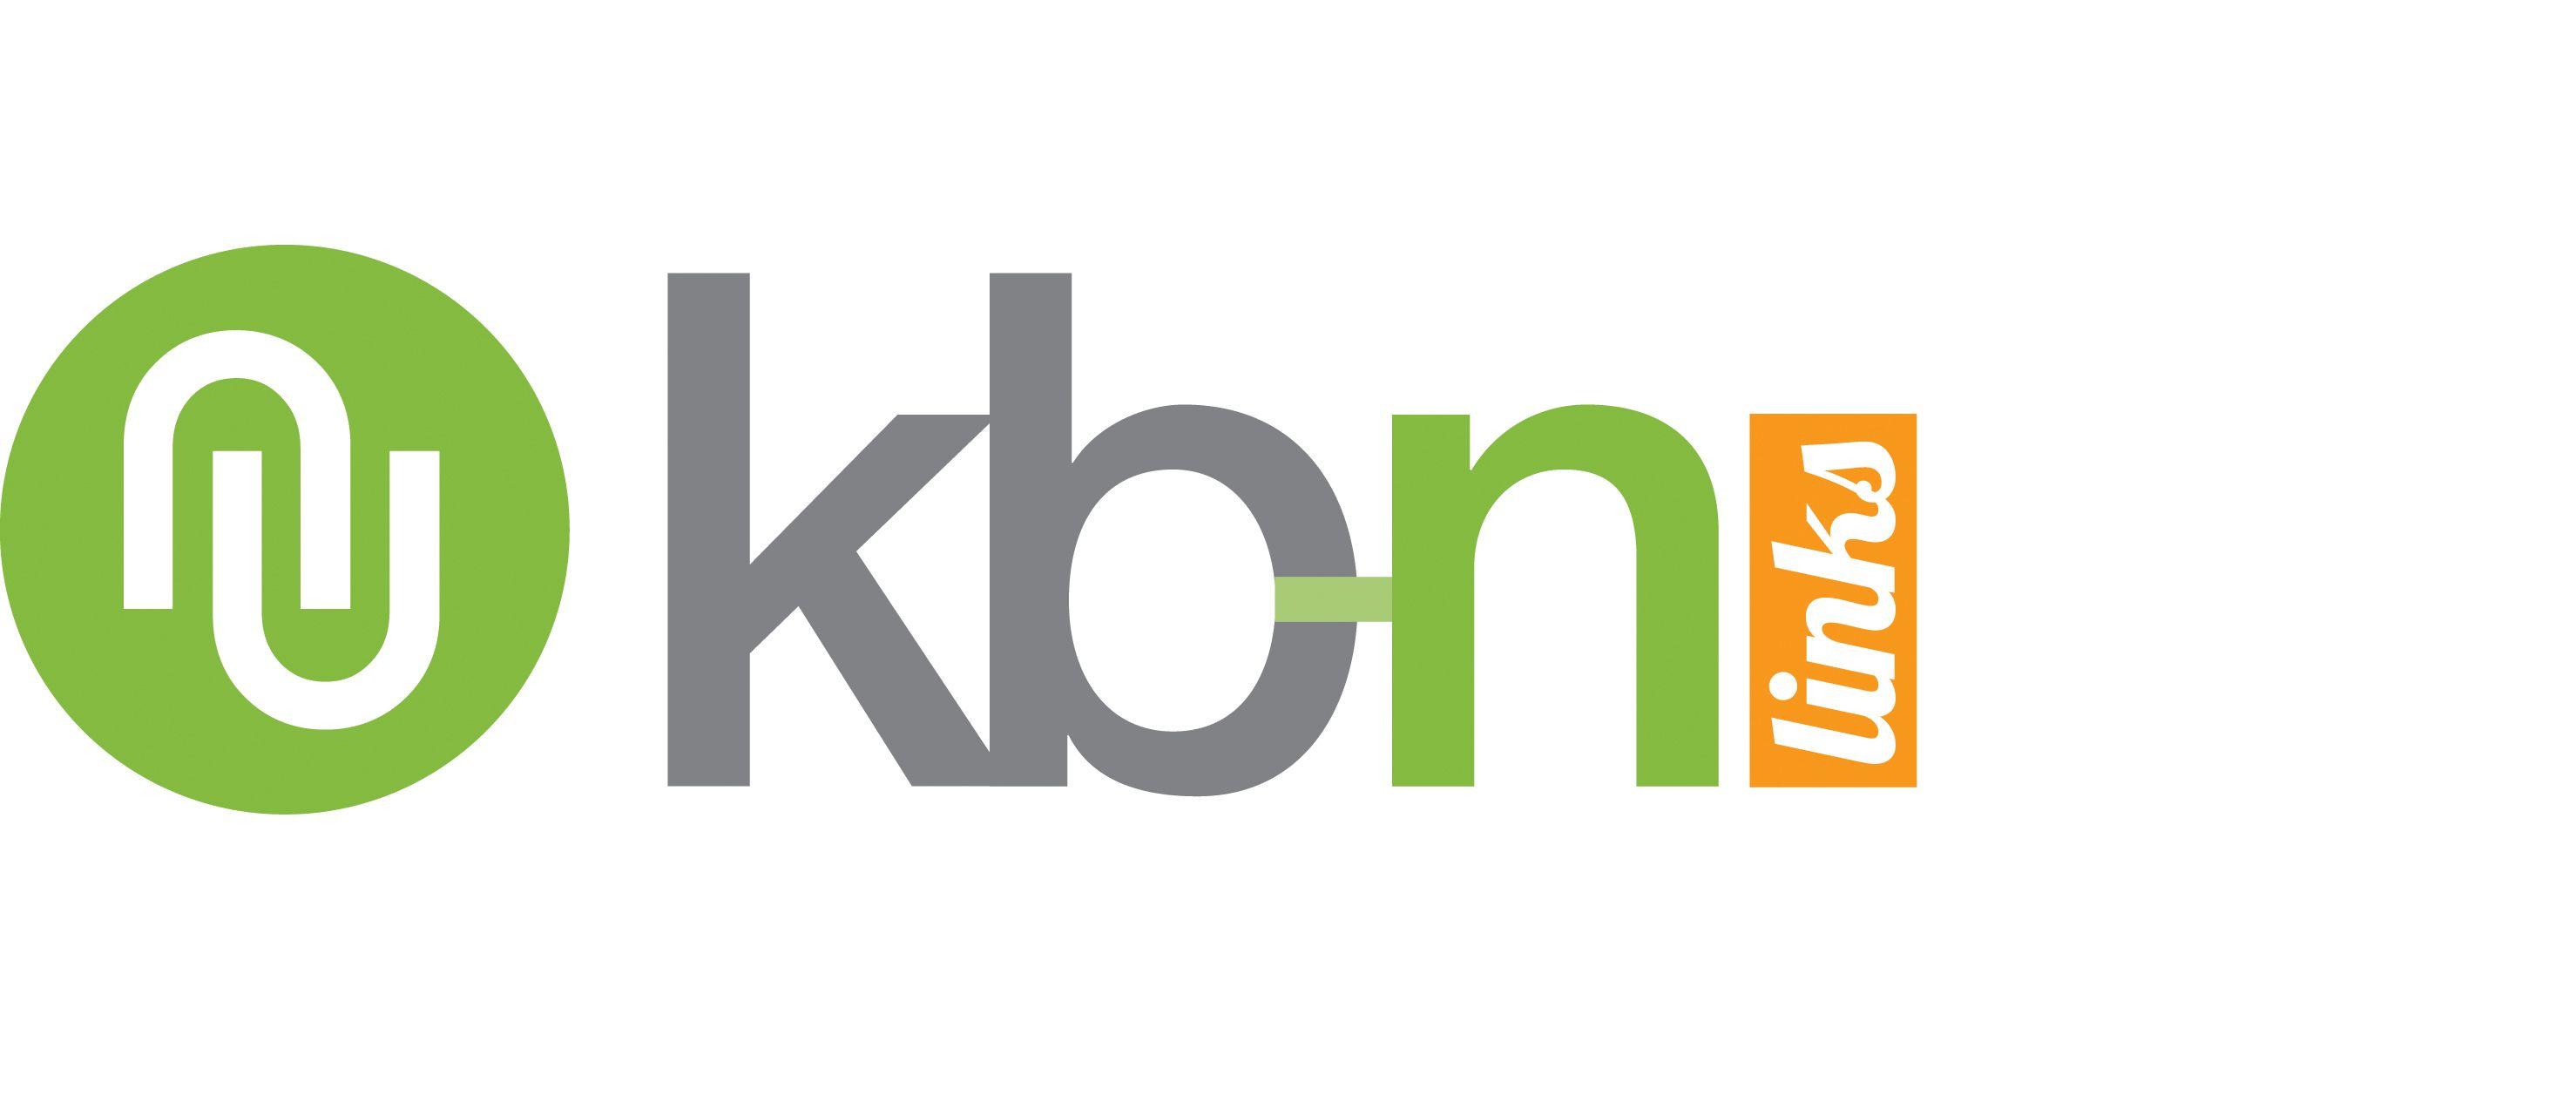 kb-network Links www.kb-network.co.uk